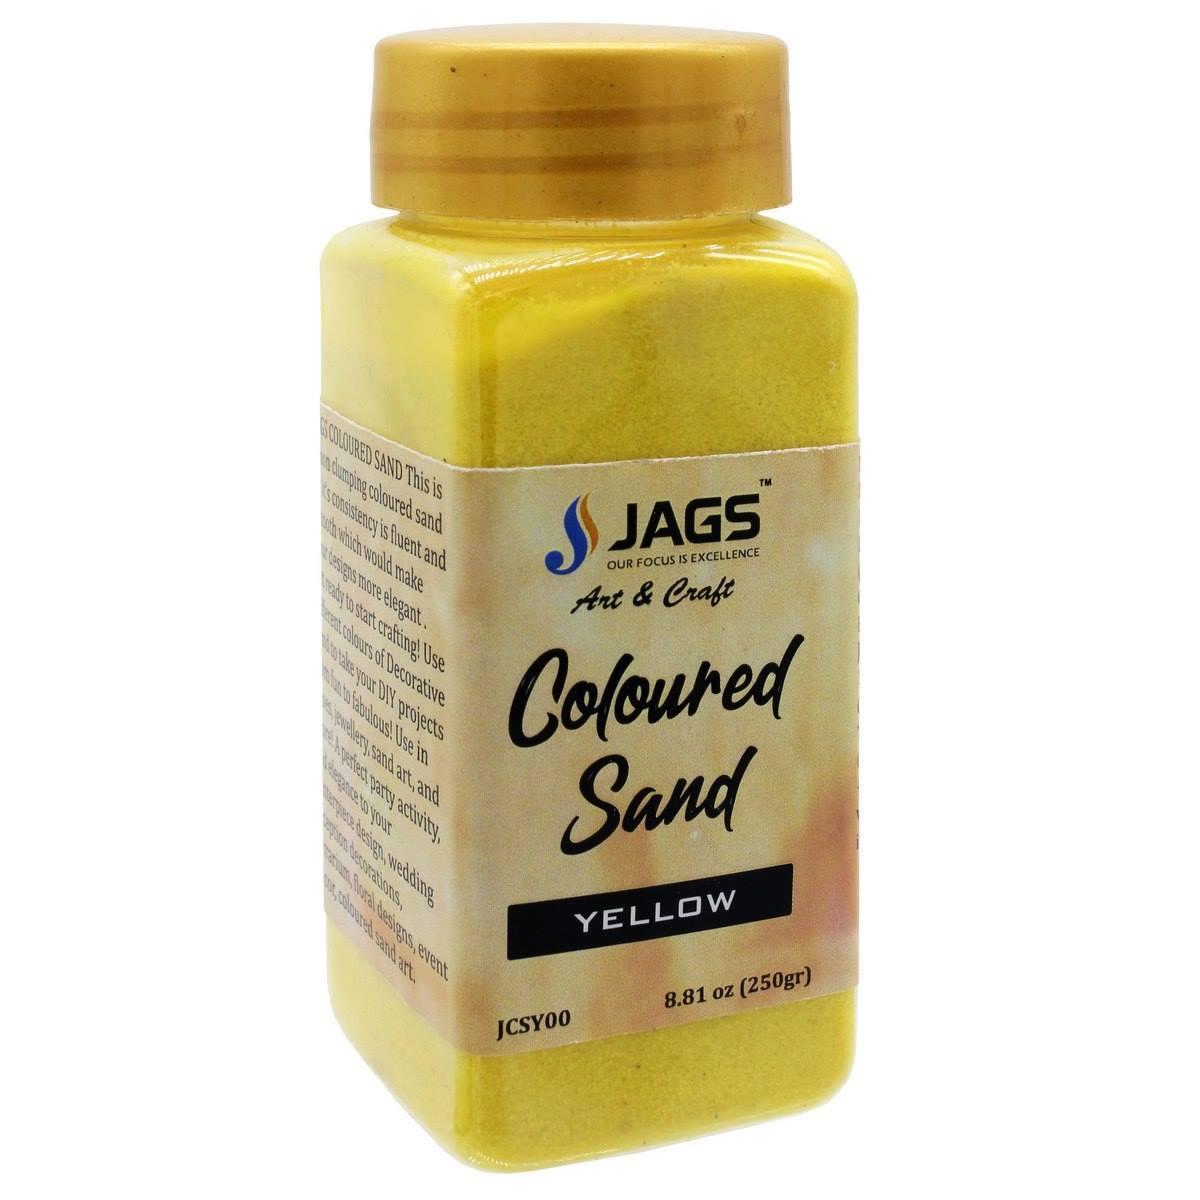 Coloured Sand Yellow